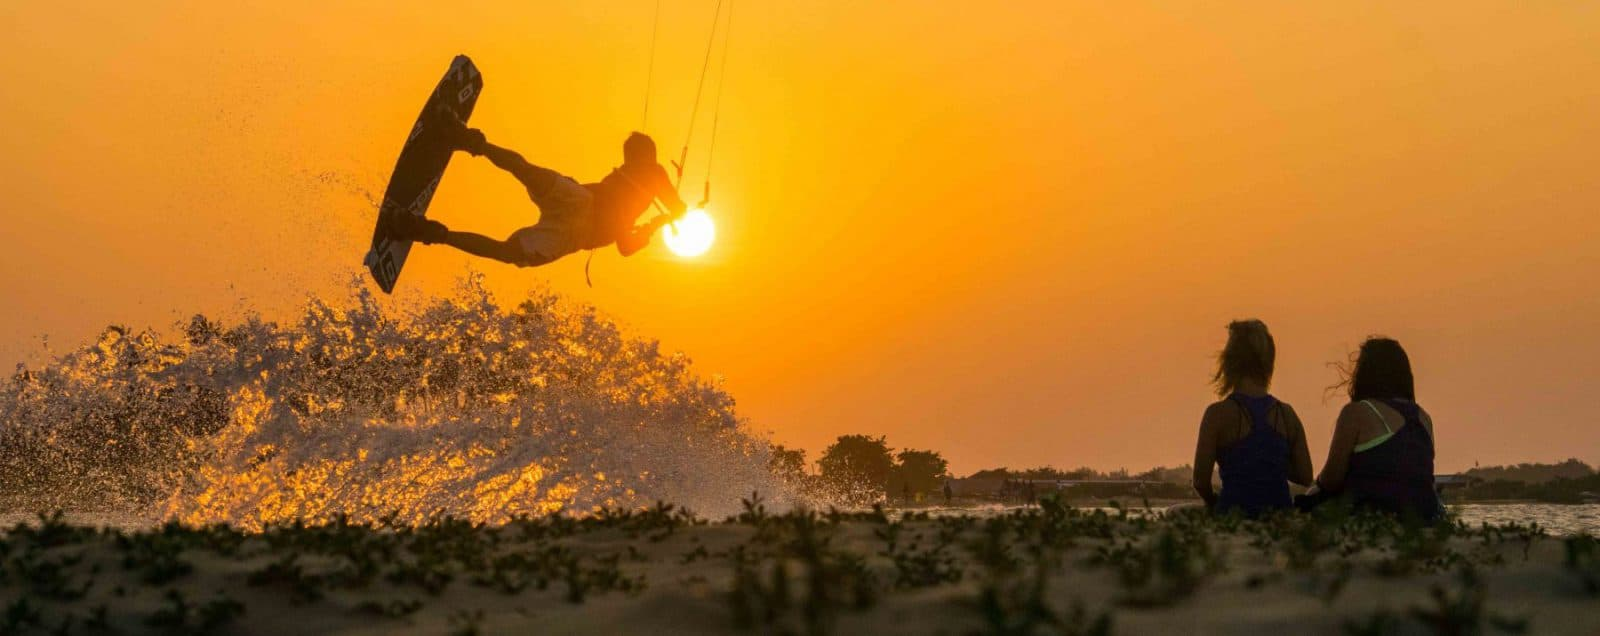 Kitesurfen Coaching